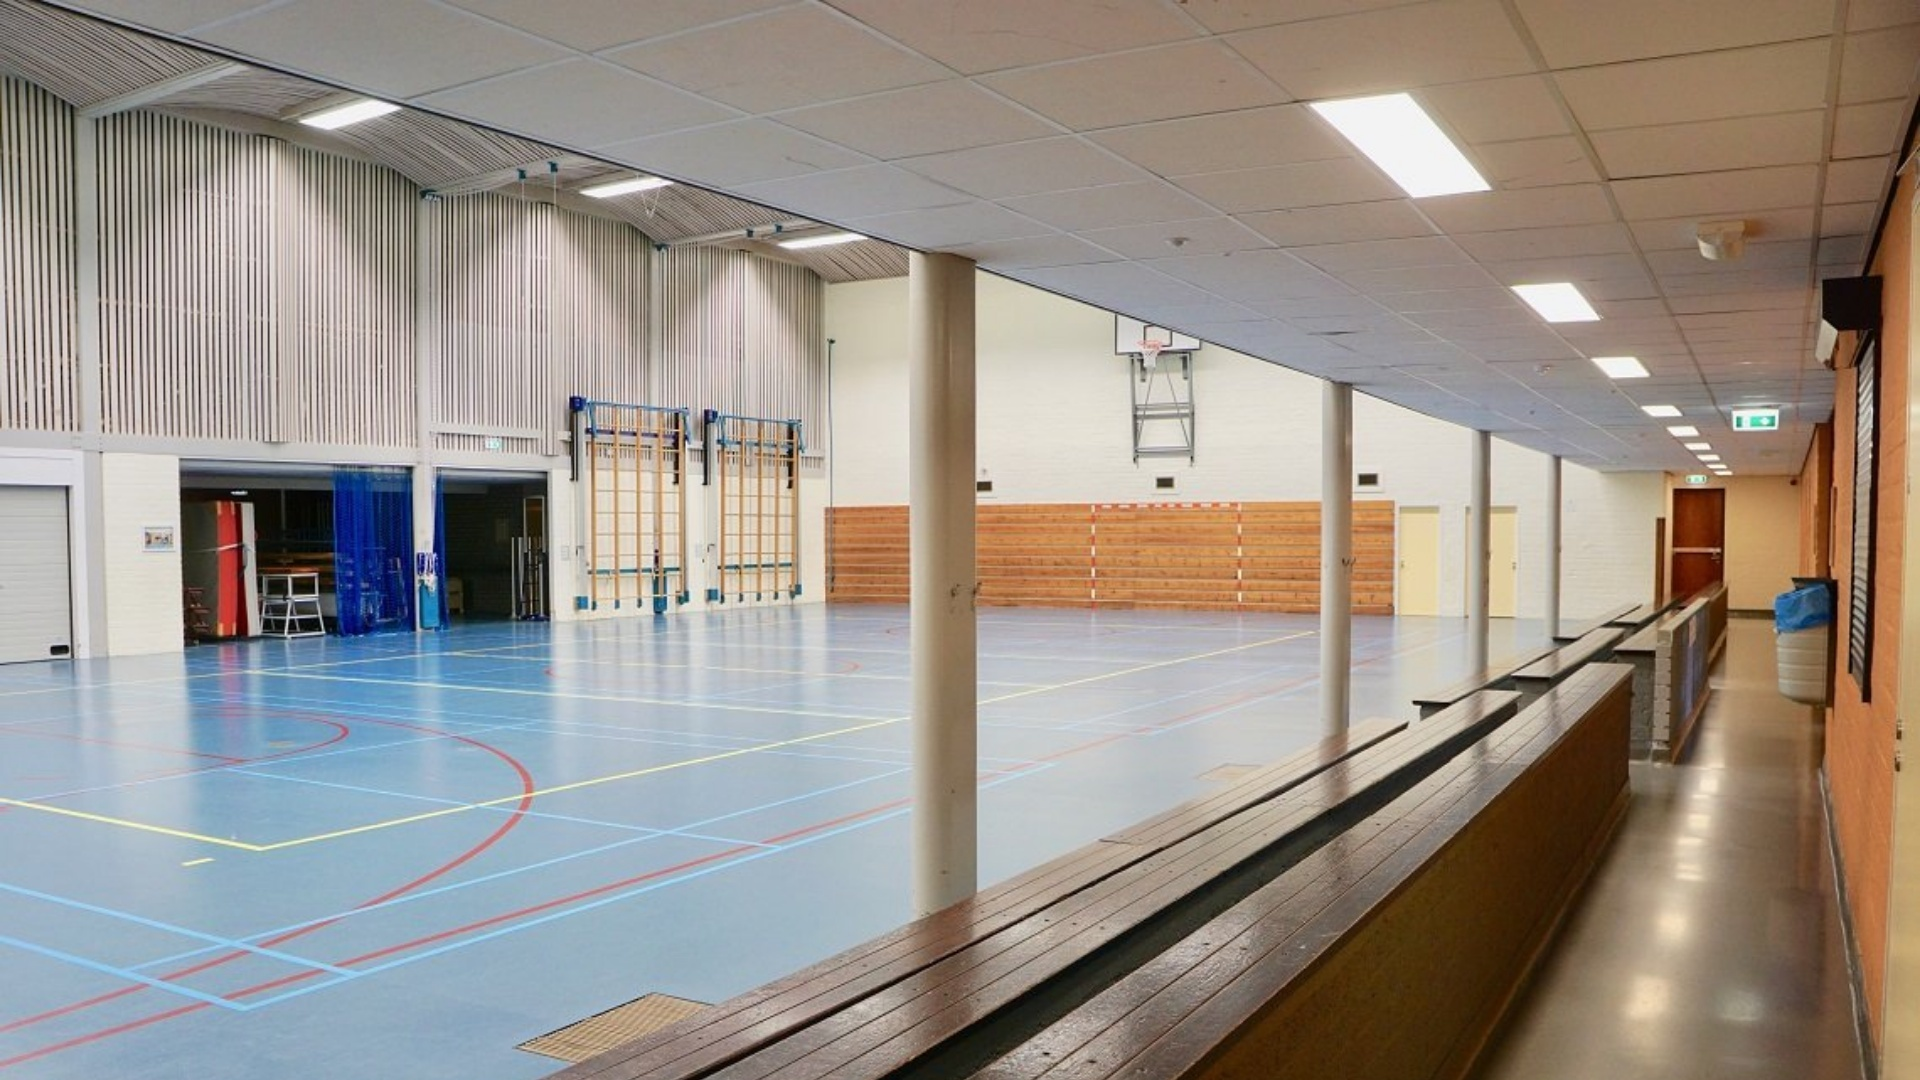 sporthal-poortdijk-dsc07879-b-brosi-p1140.jpg